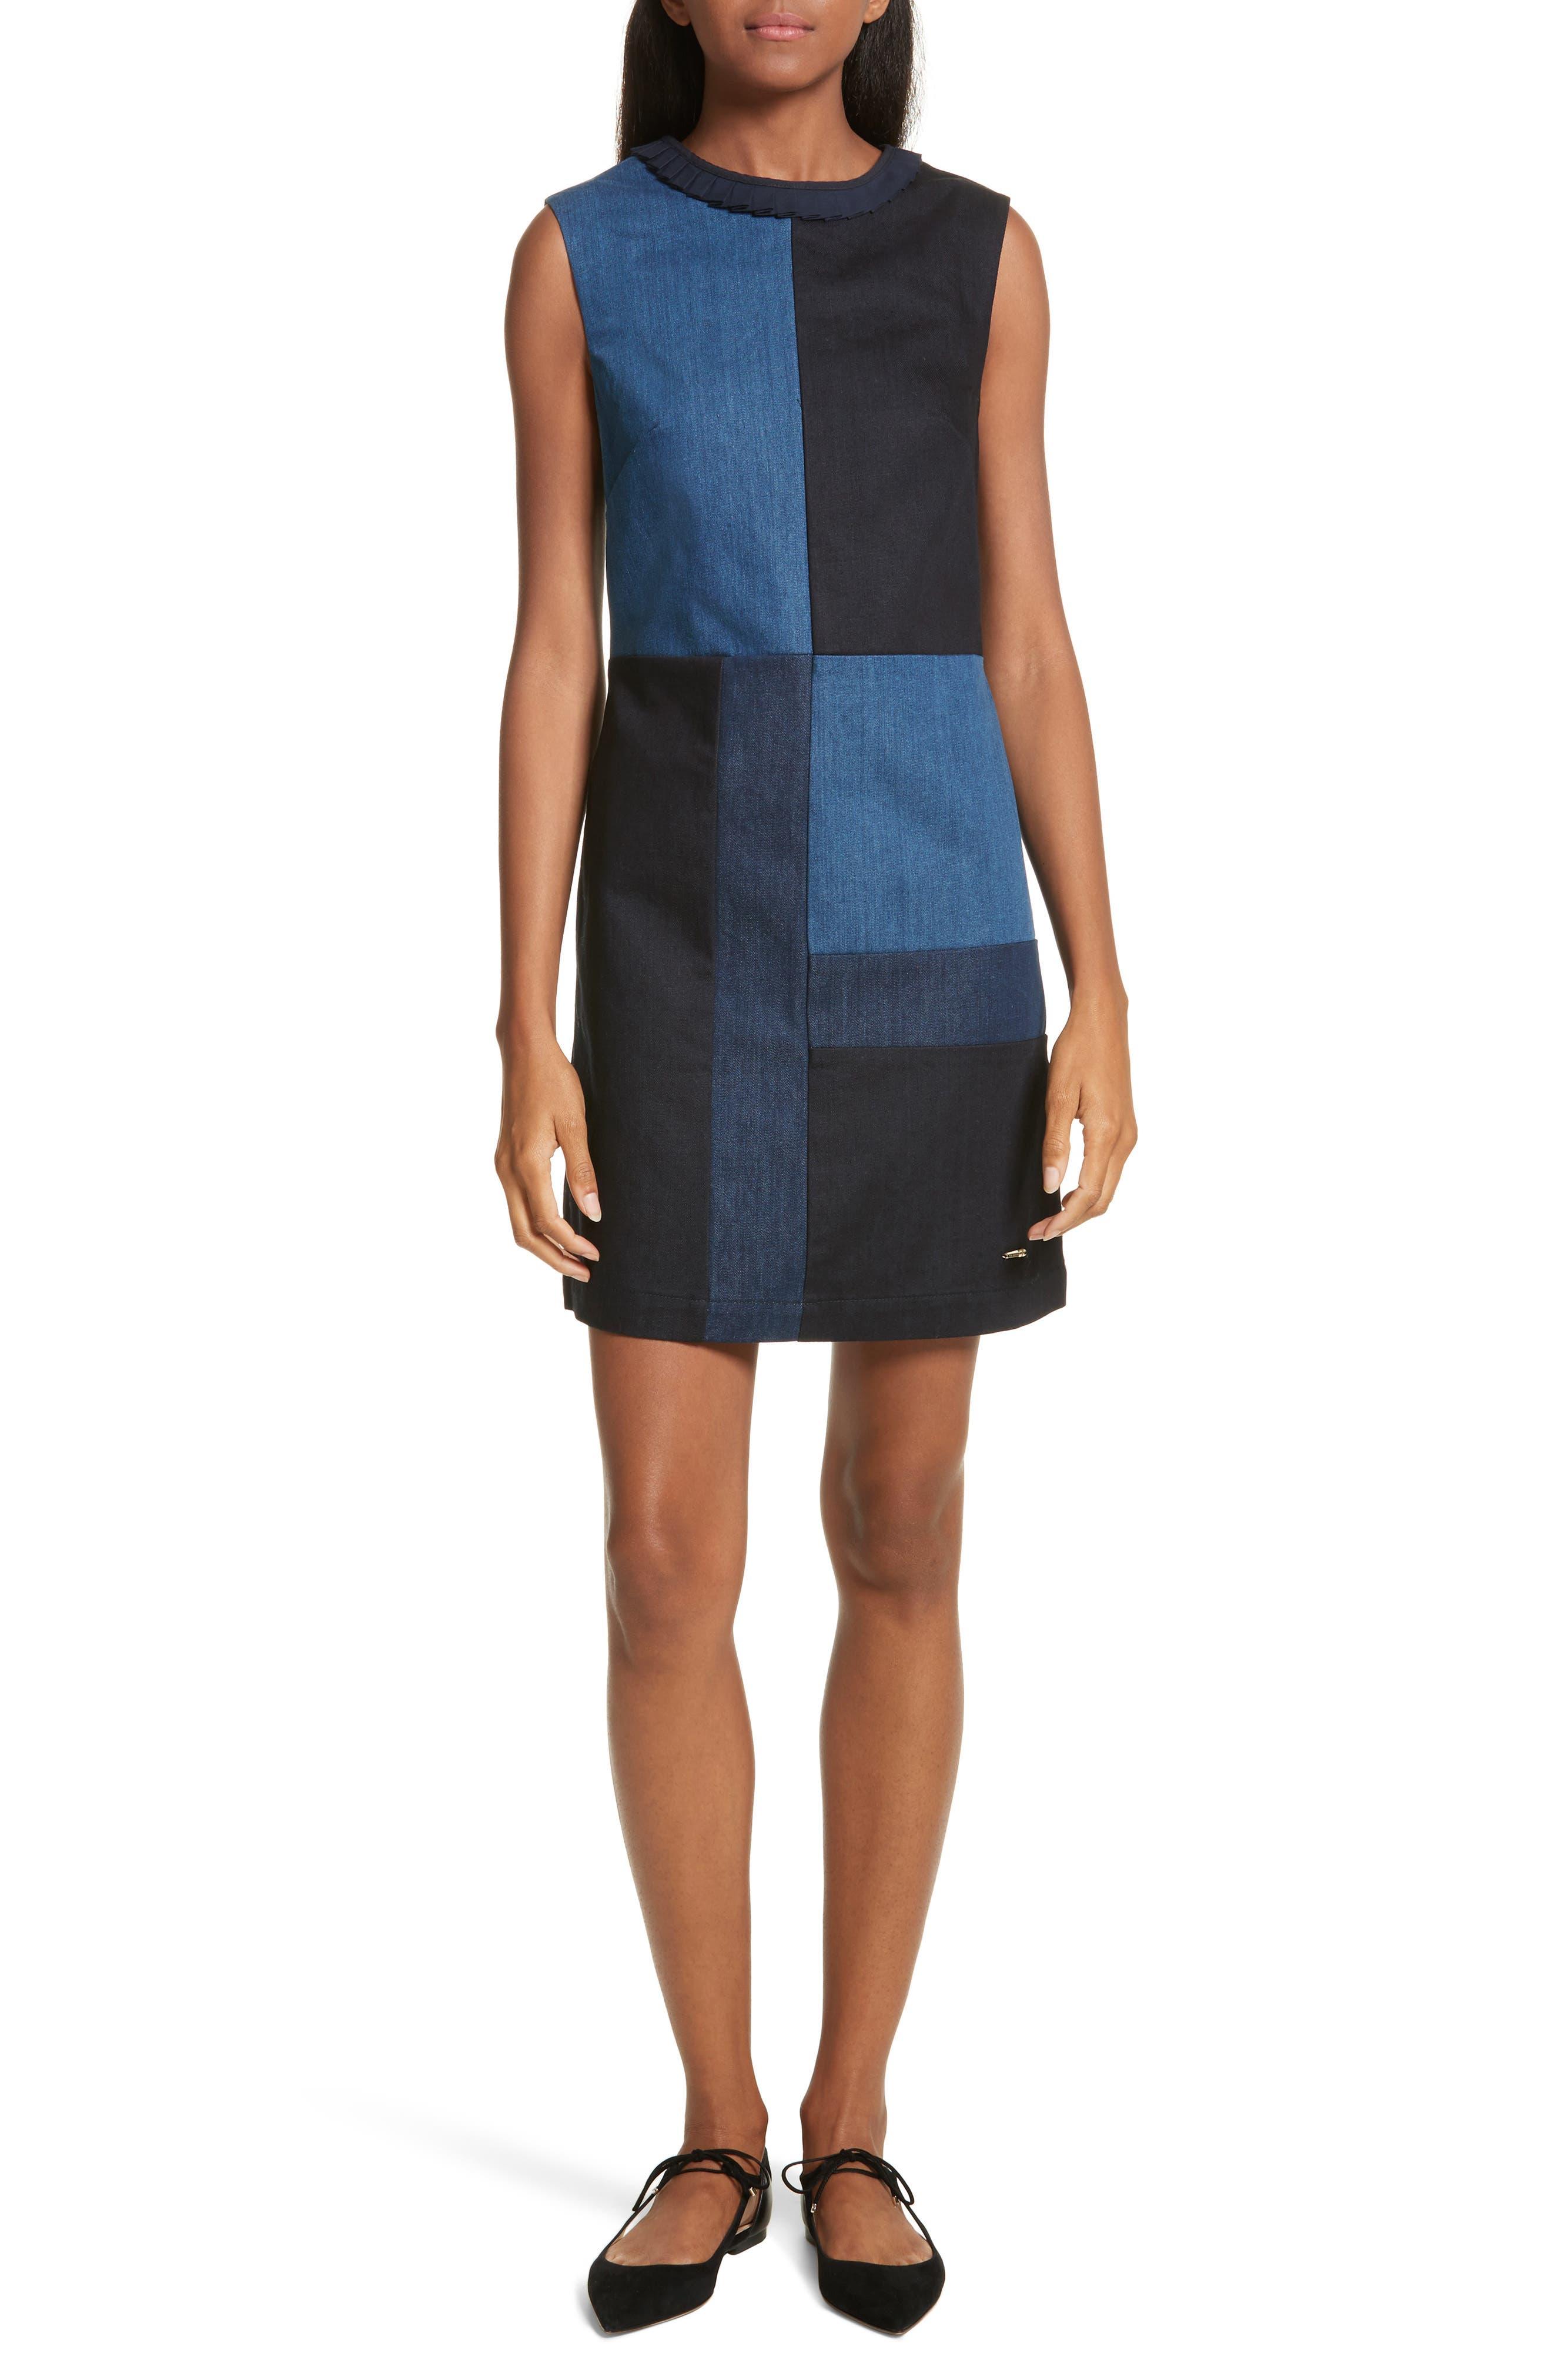 Ted Baker Morfee London Colorblock Denim A-Line Dress,                             Main thumbnail 1, color,                             431